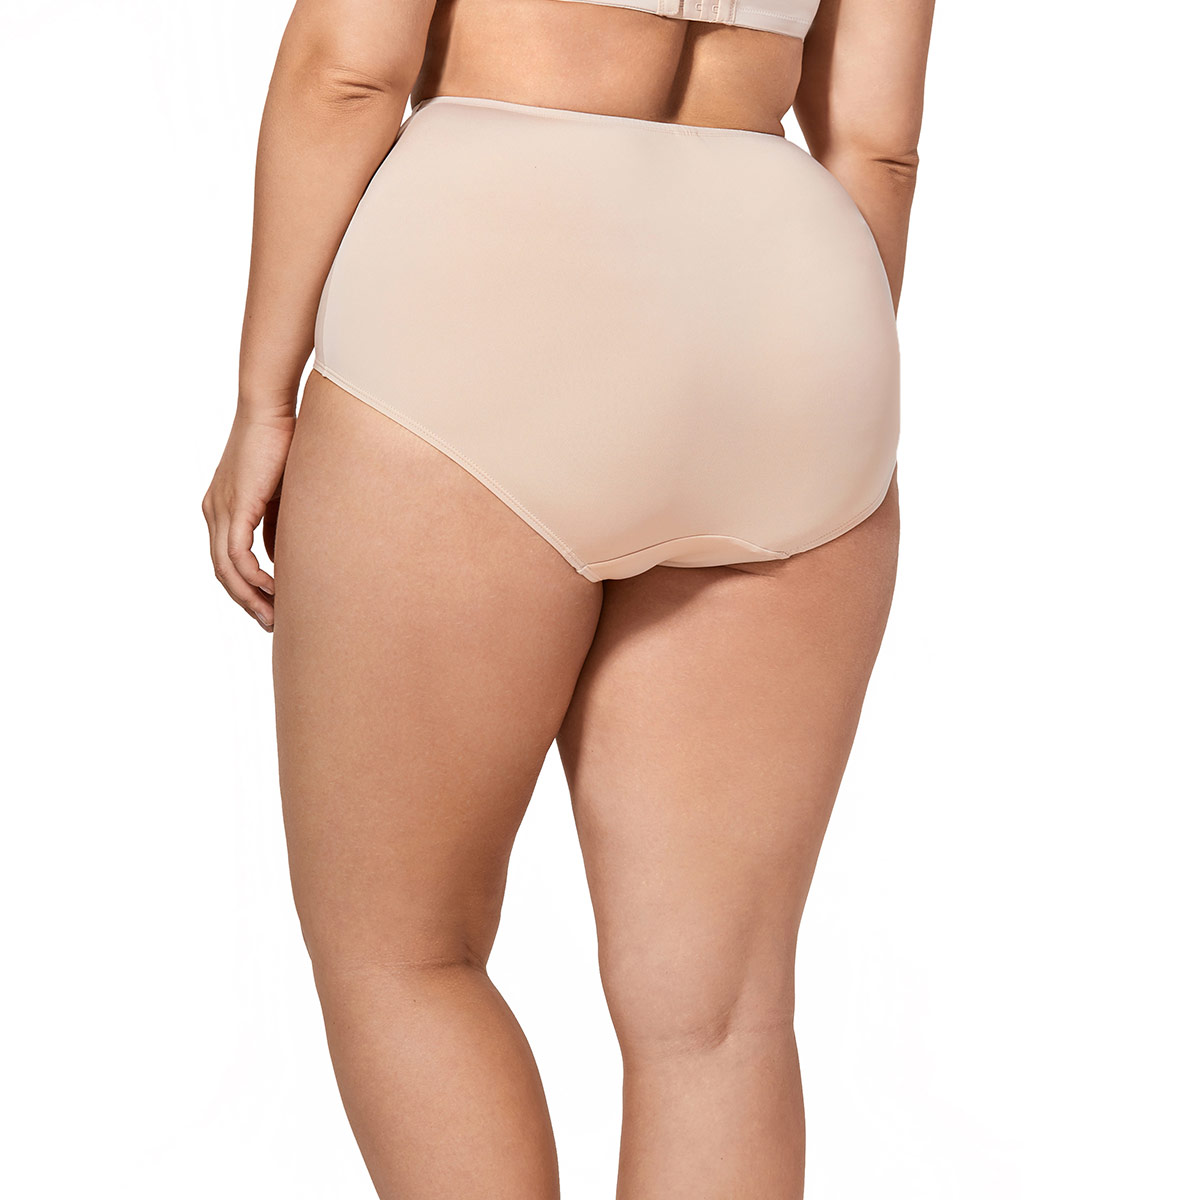 7397e947c84 Women s 2 Pack Plus Size High Cut Briefs Panties High Waist Full Coverage  Underwear-in women s panties from Underwear   Sleepwears on Aliexpress.com  ...